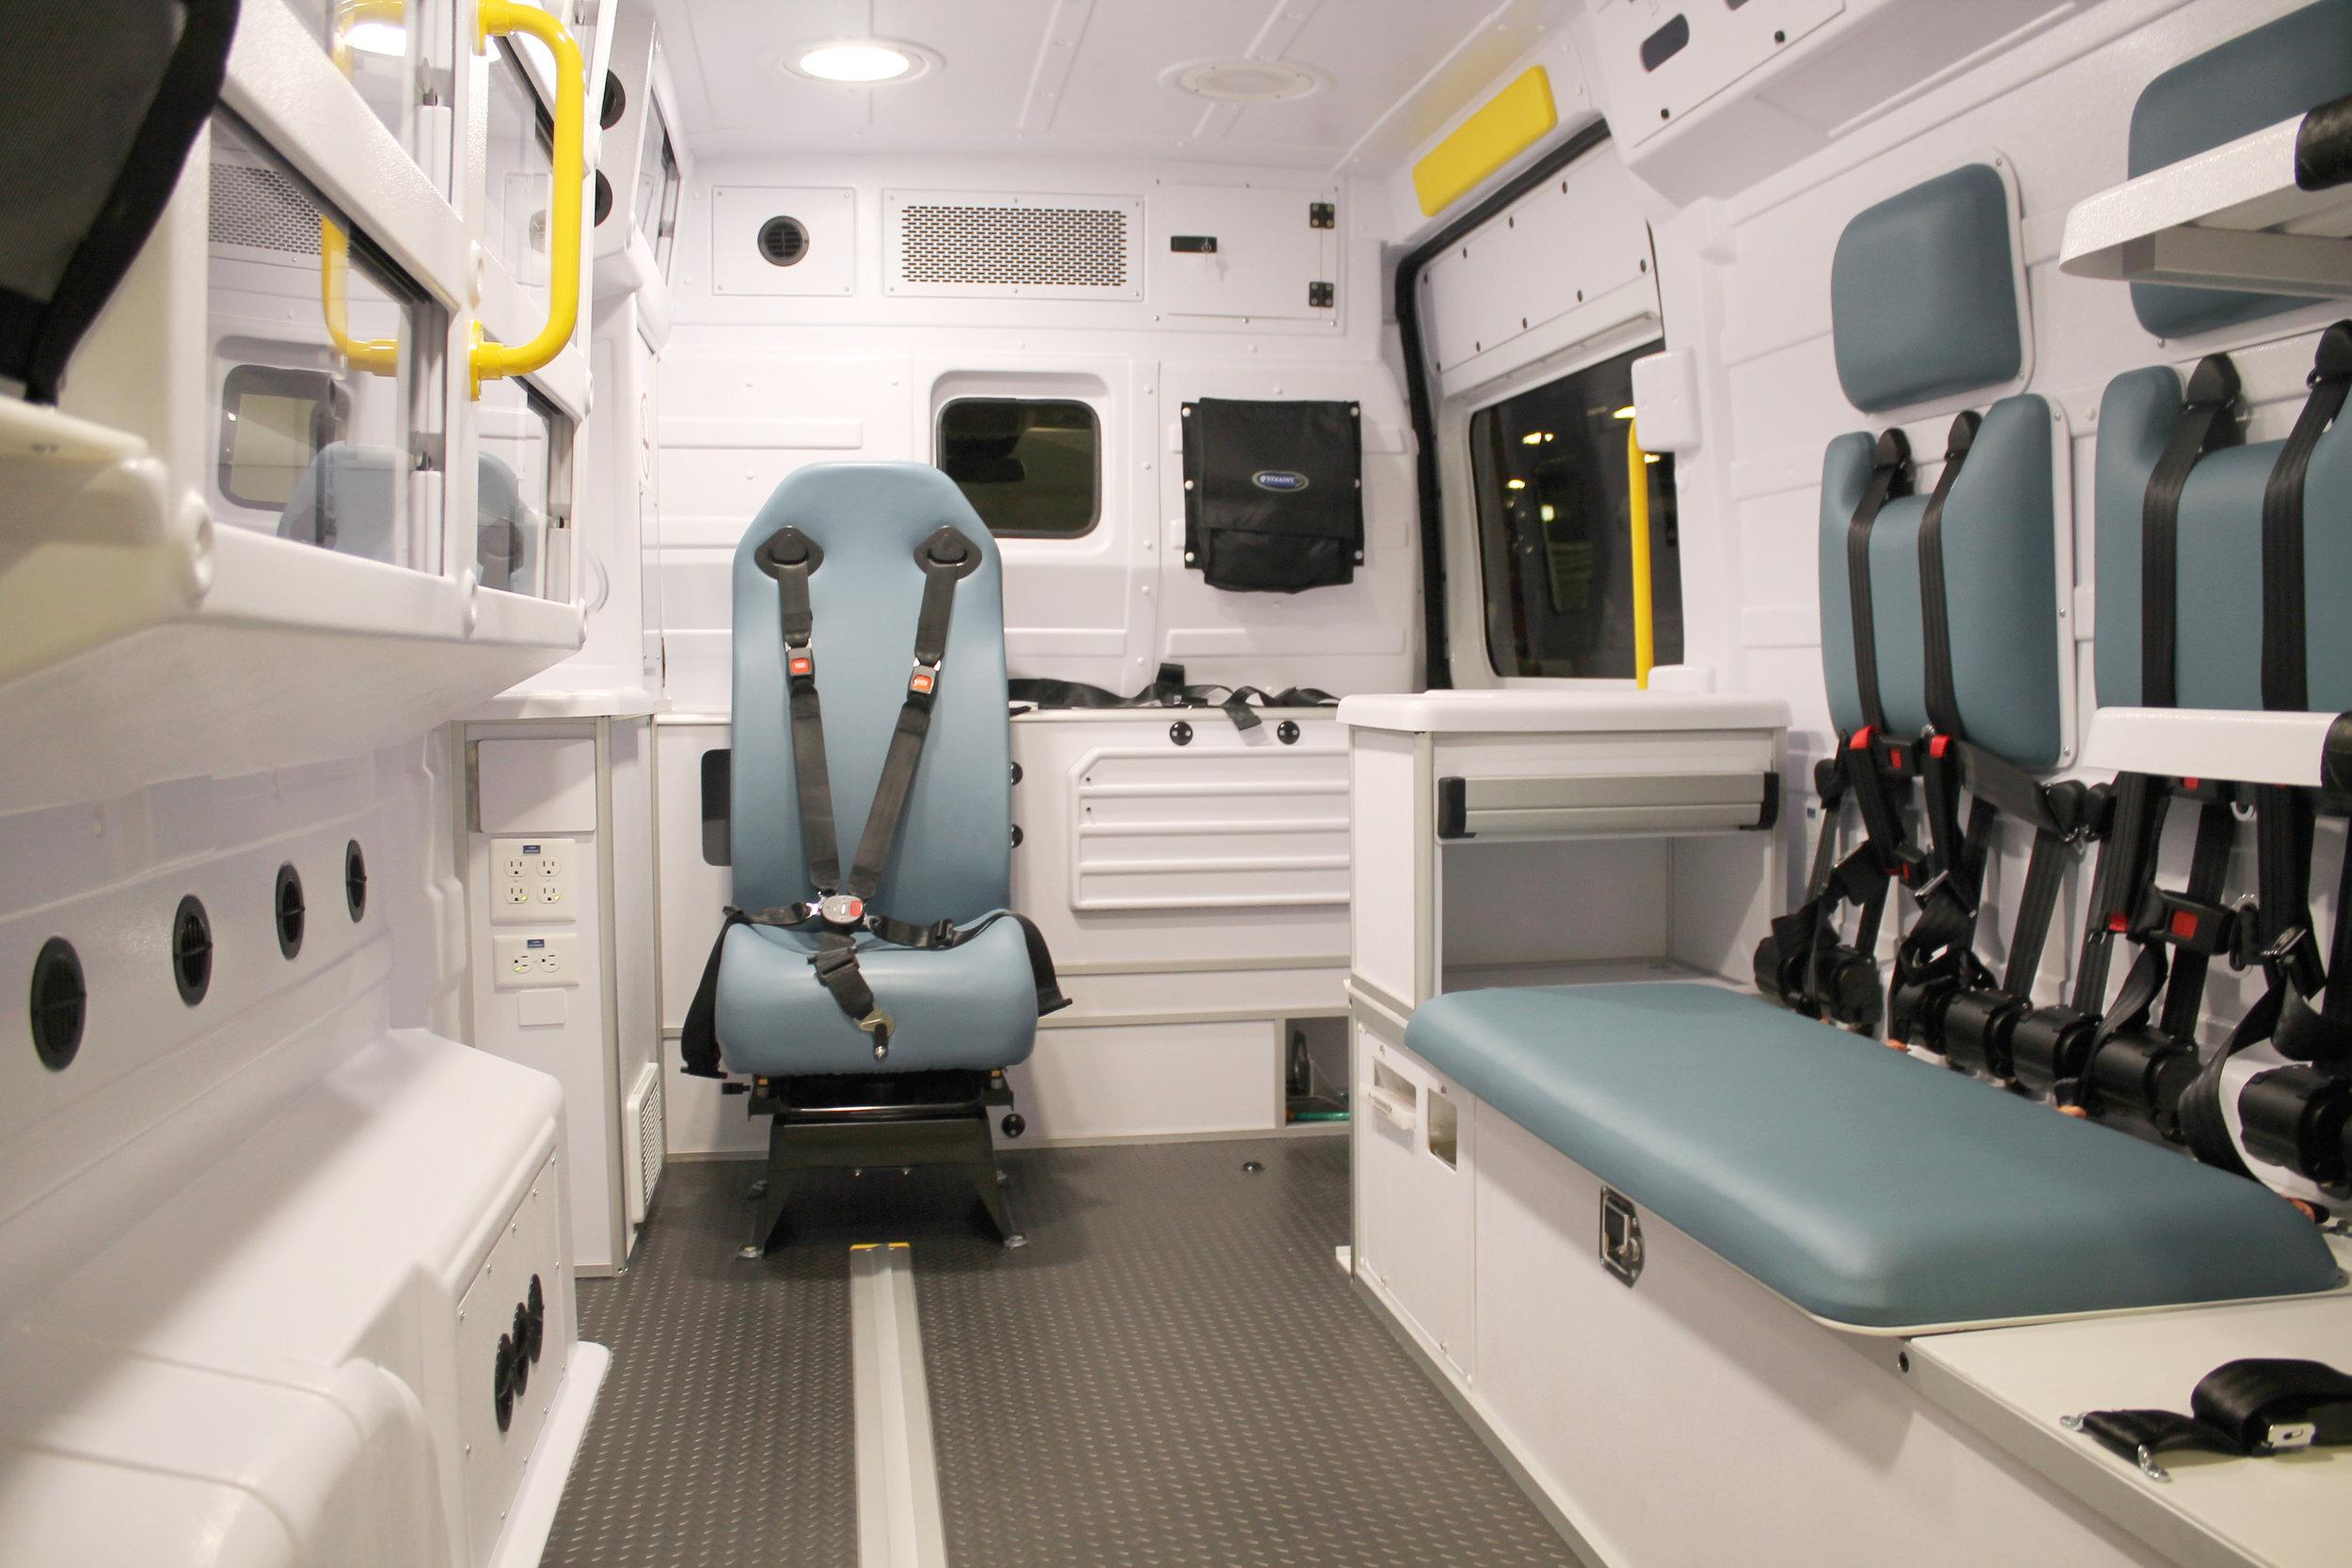 2018-a1081-rwj-barnabas-promaster-ambulance_003.JPG